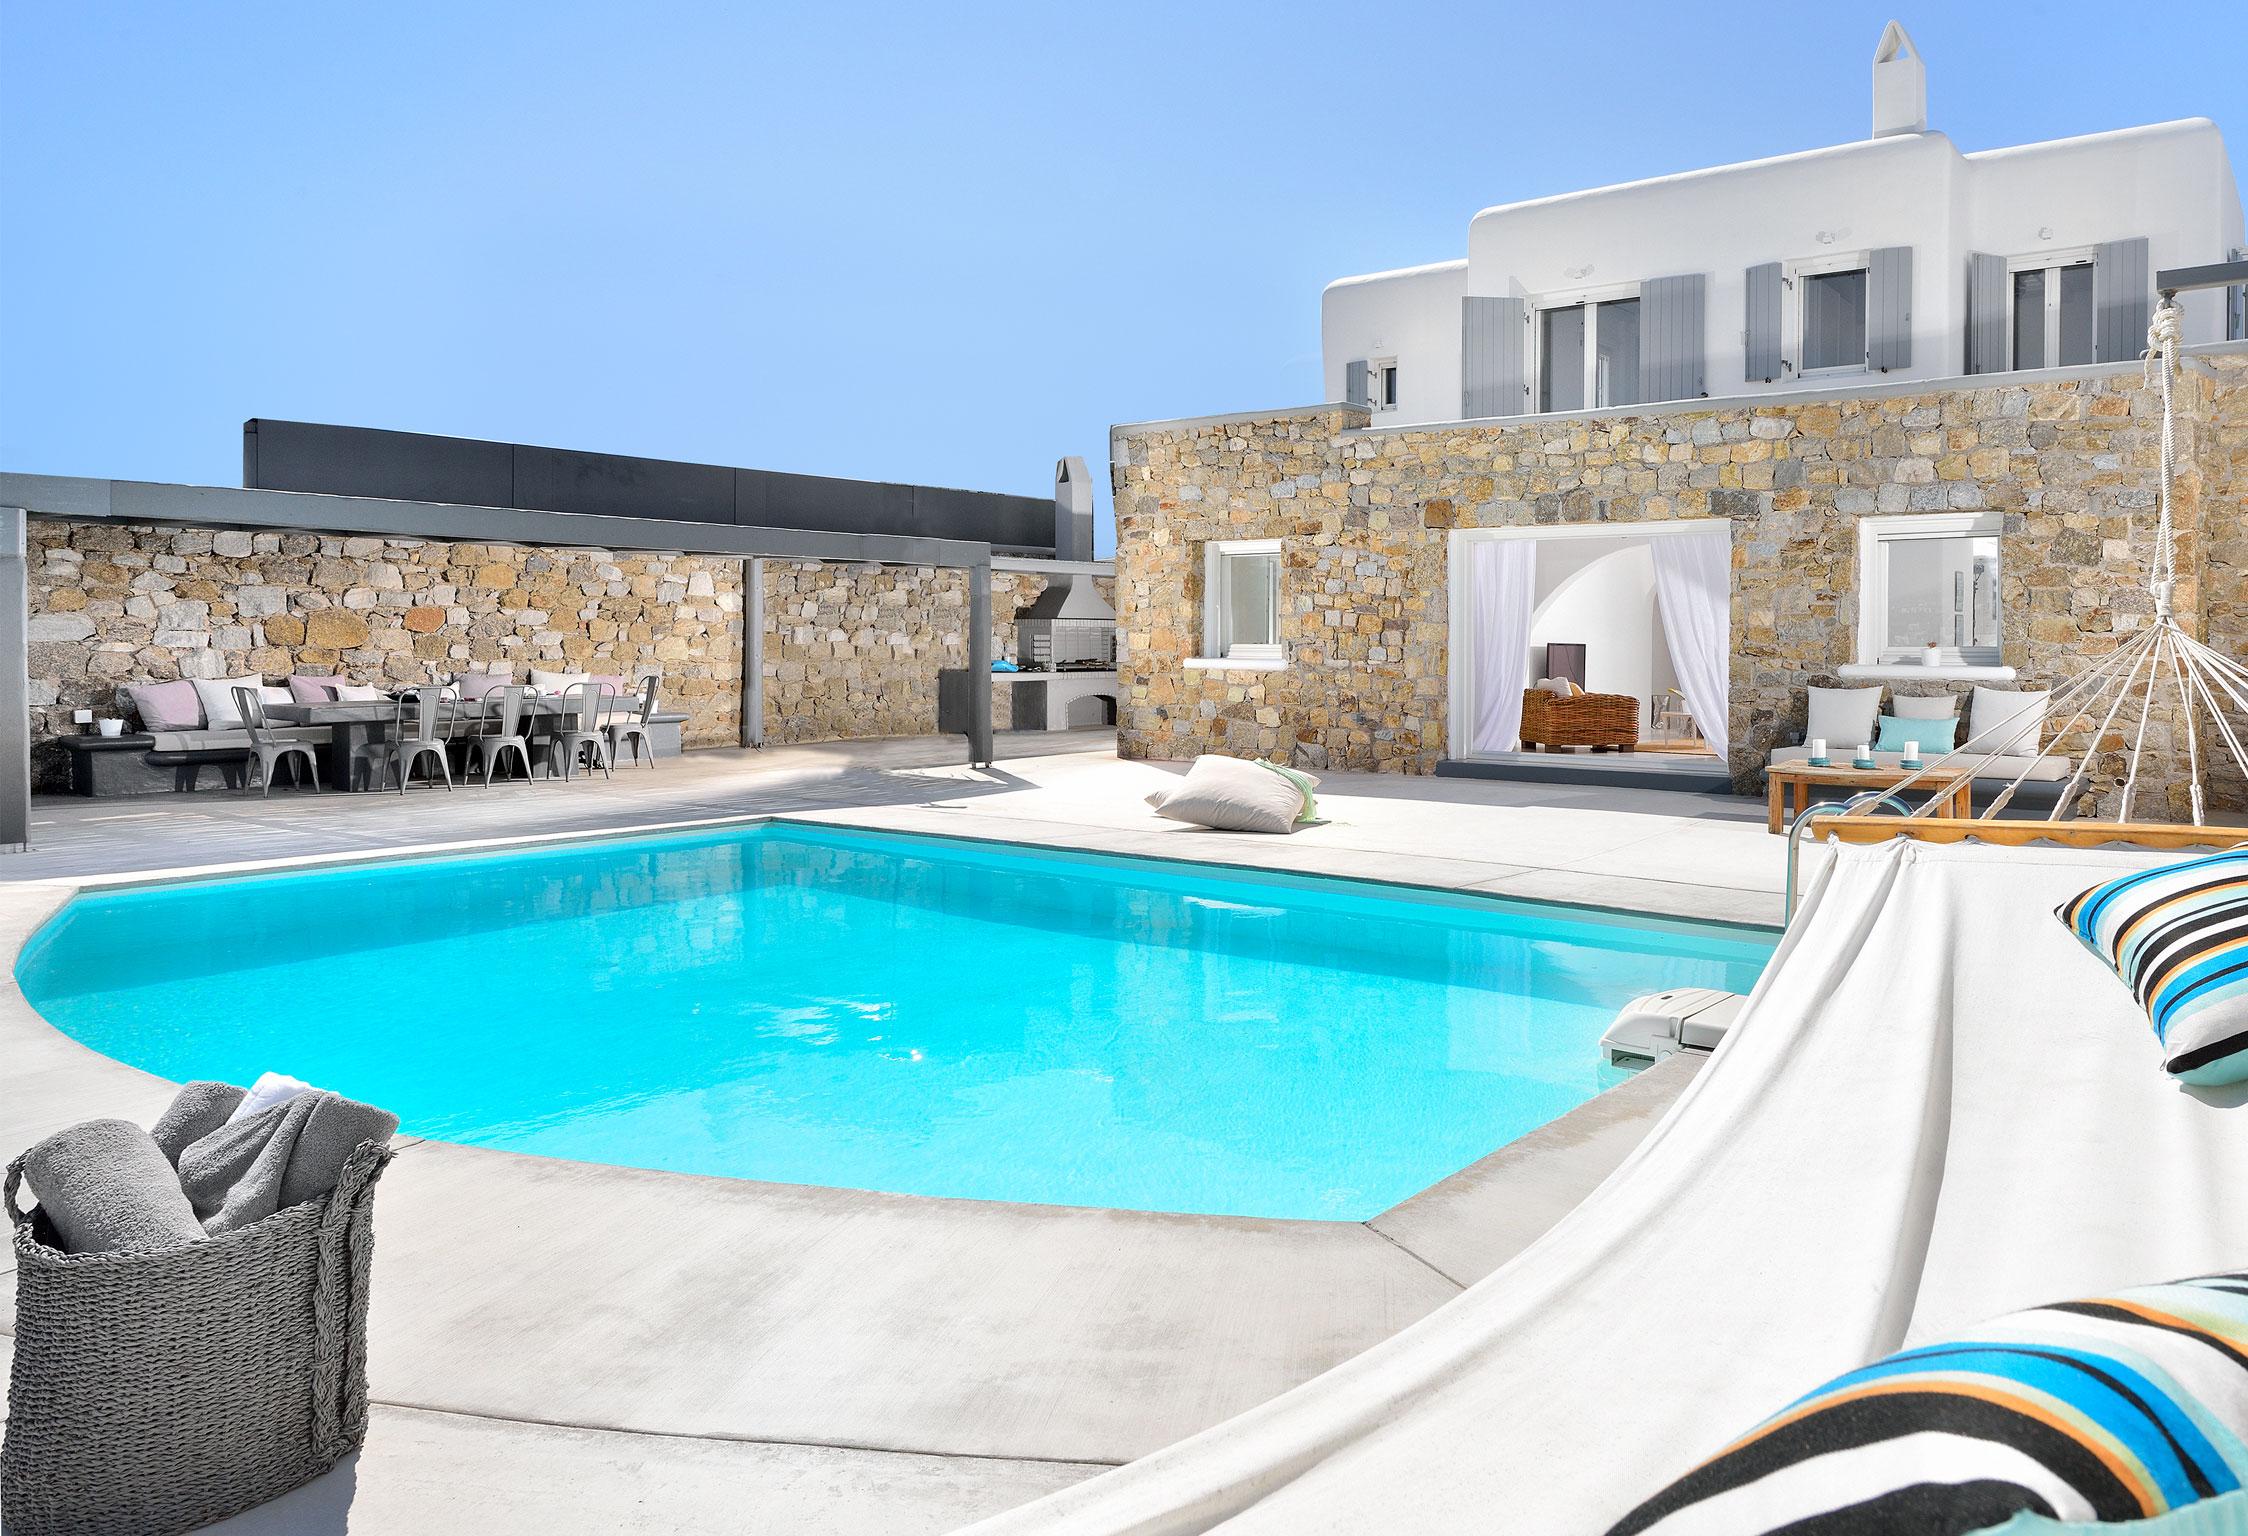 Mykonos Villa Aqua 2 jumbotron image